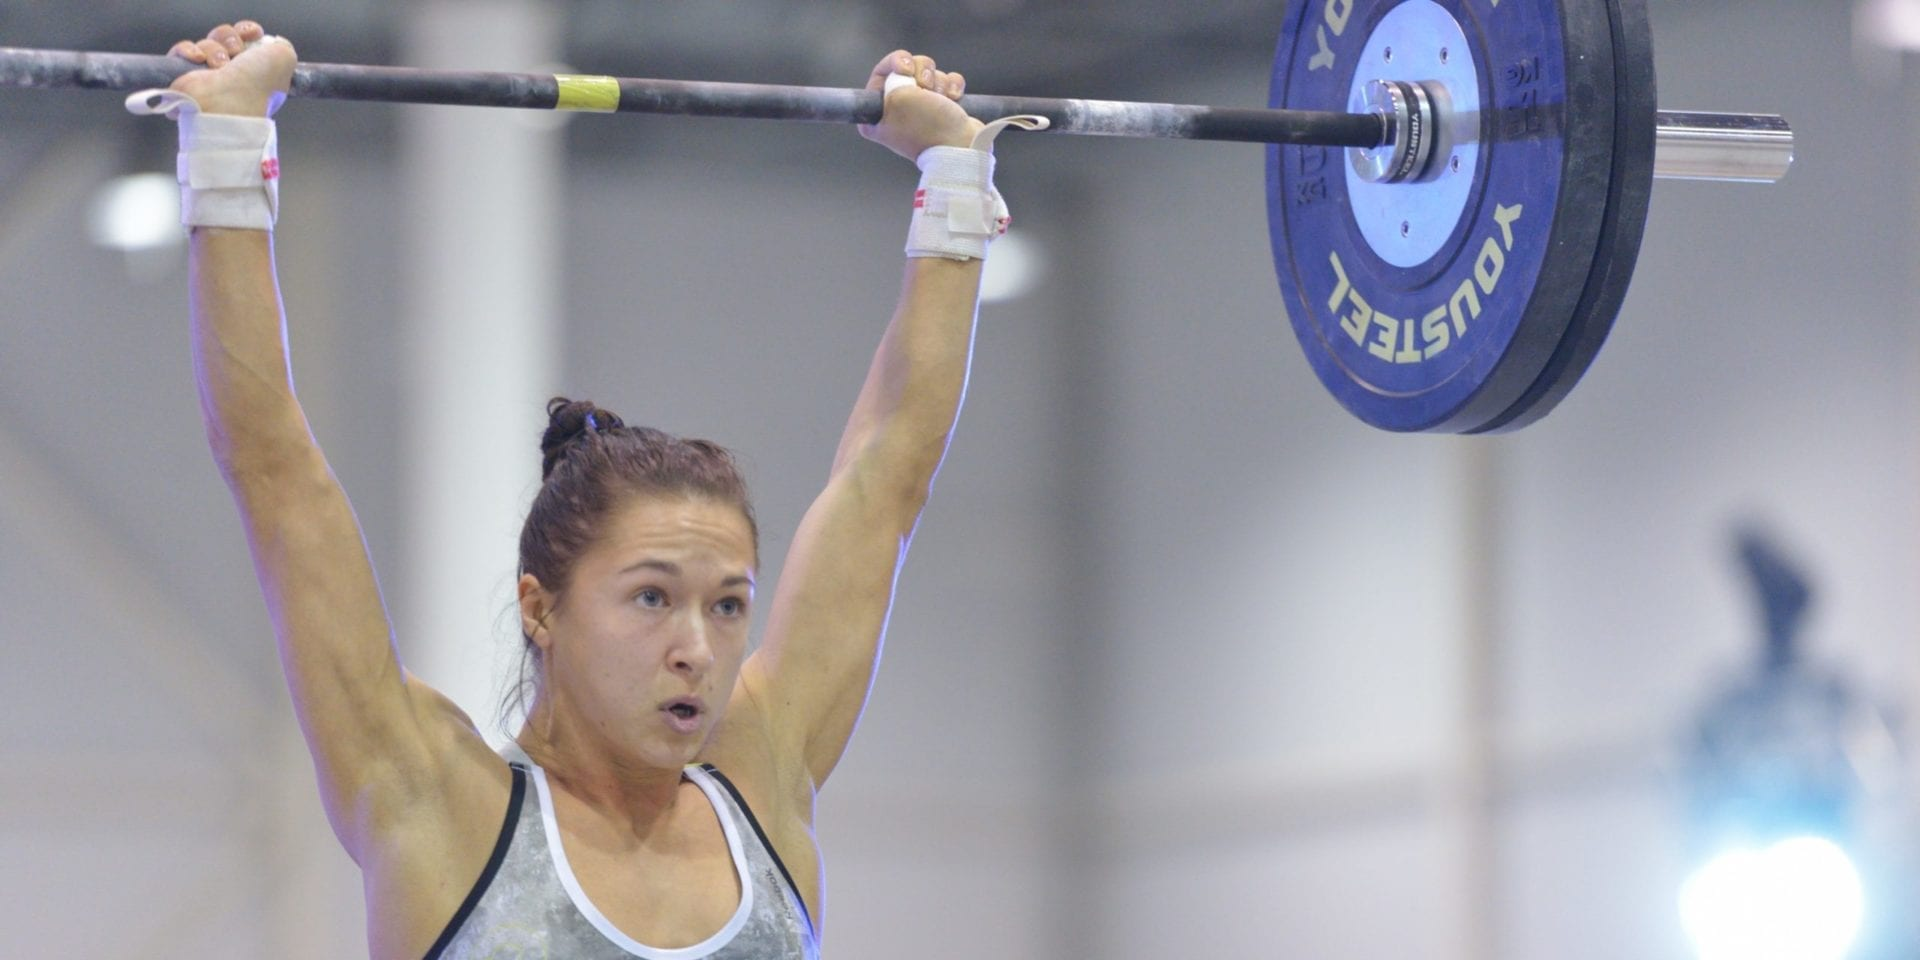 Strength, Endurance, & Gaining Muscle on Keto